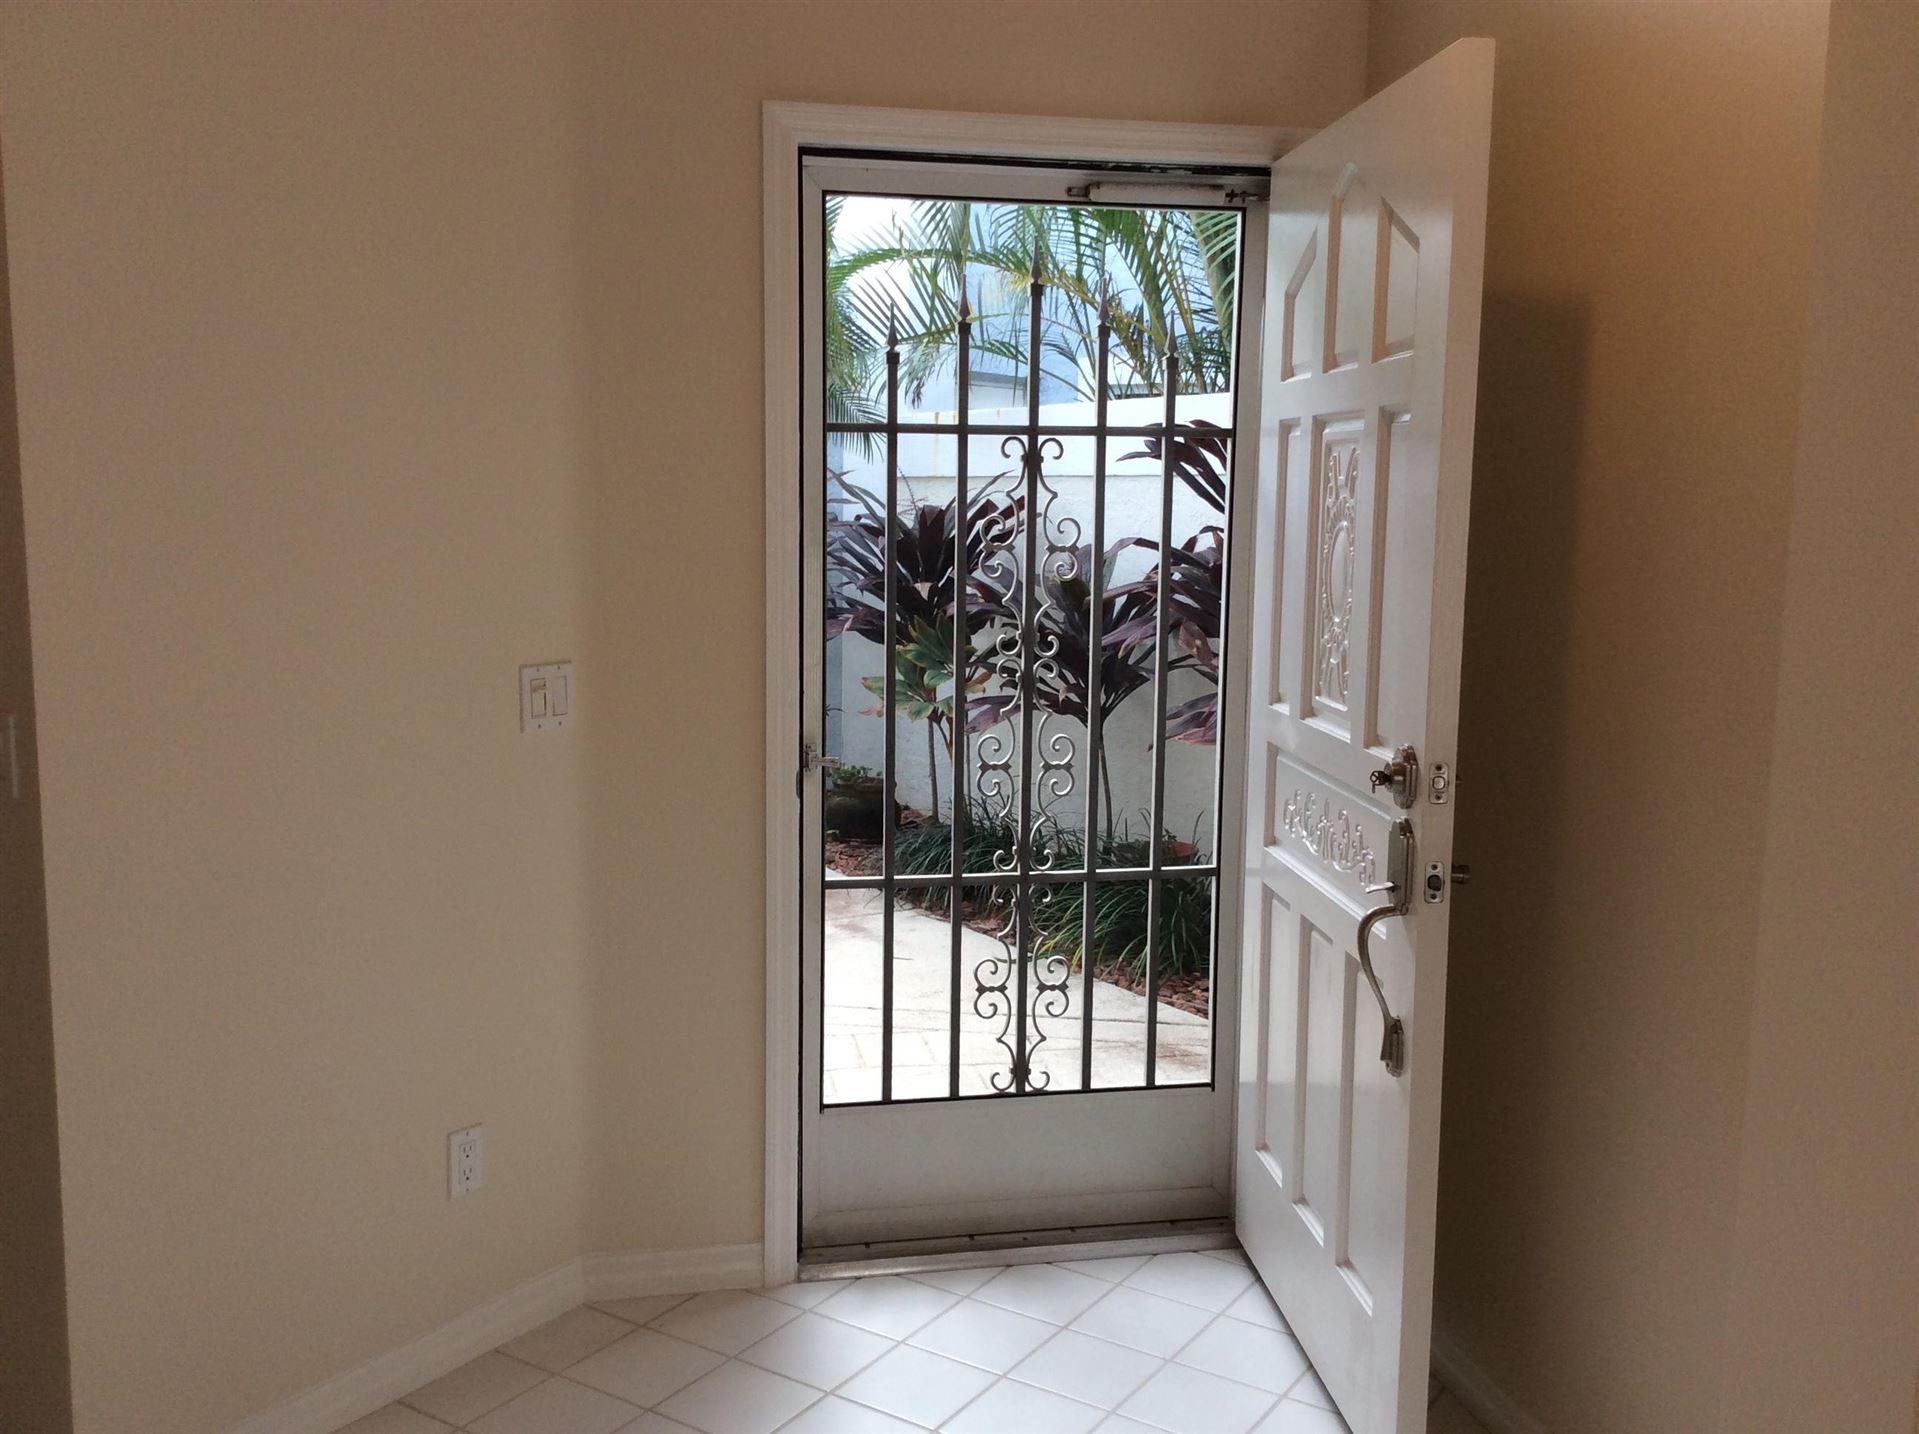 Photo of 6 Elgin Lane, Palm Beach Gardens, FL 33418 (MLS # RX-10593432)